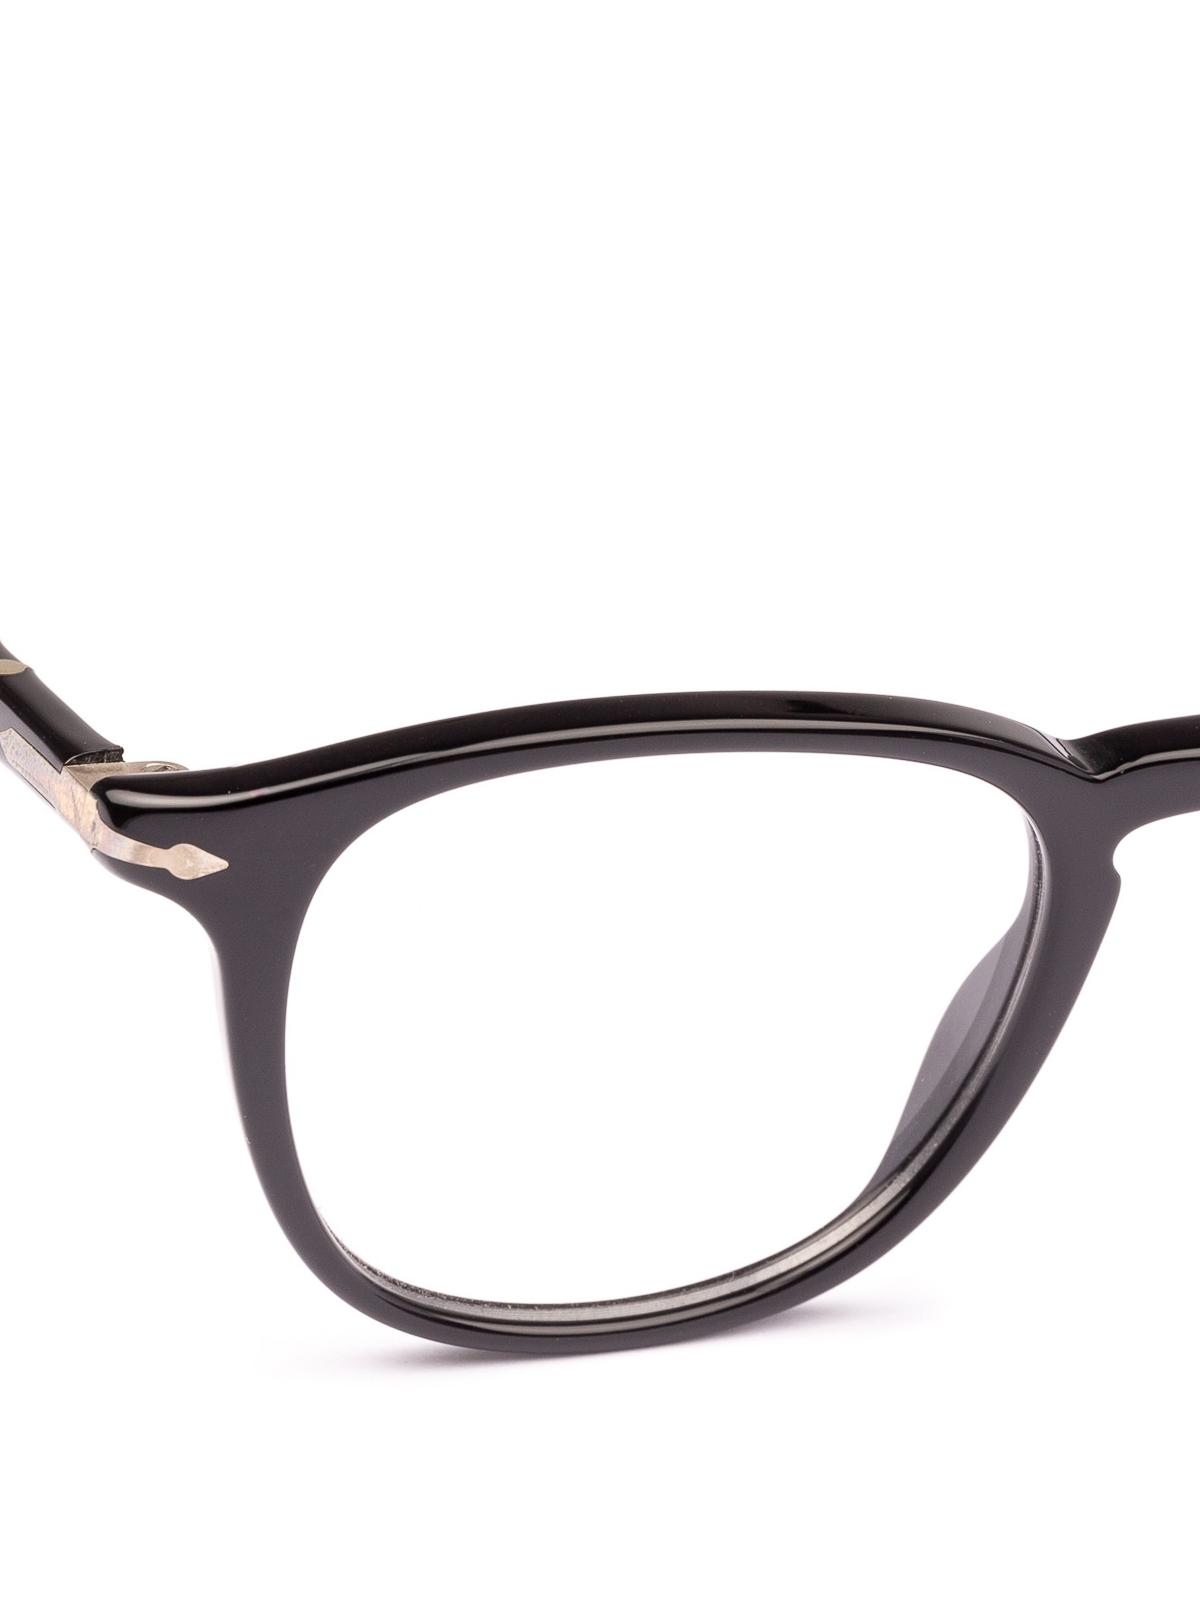 3afa0c2cab Persol - Galleria 900 black eyeglasses - glasses - PO 3143V 95 ...